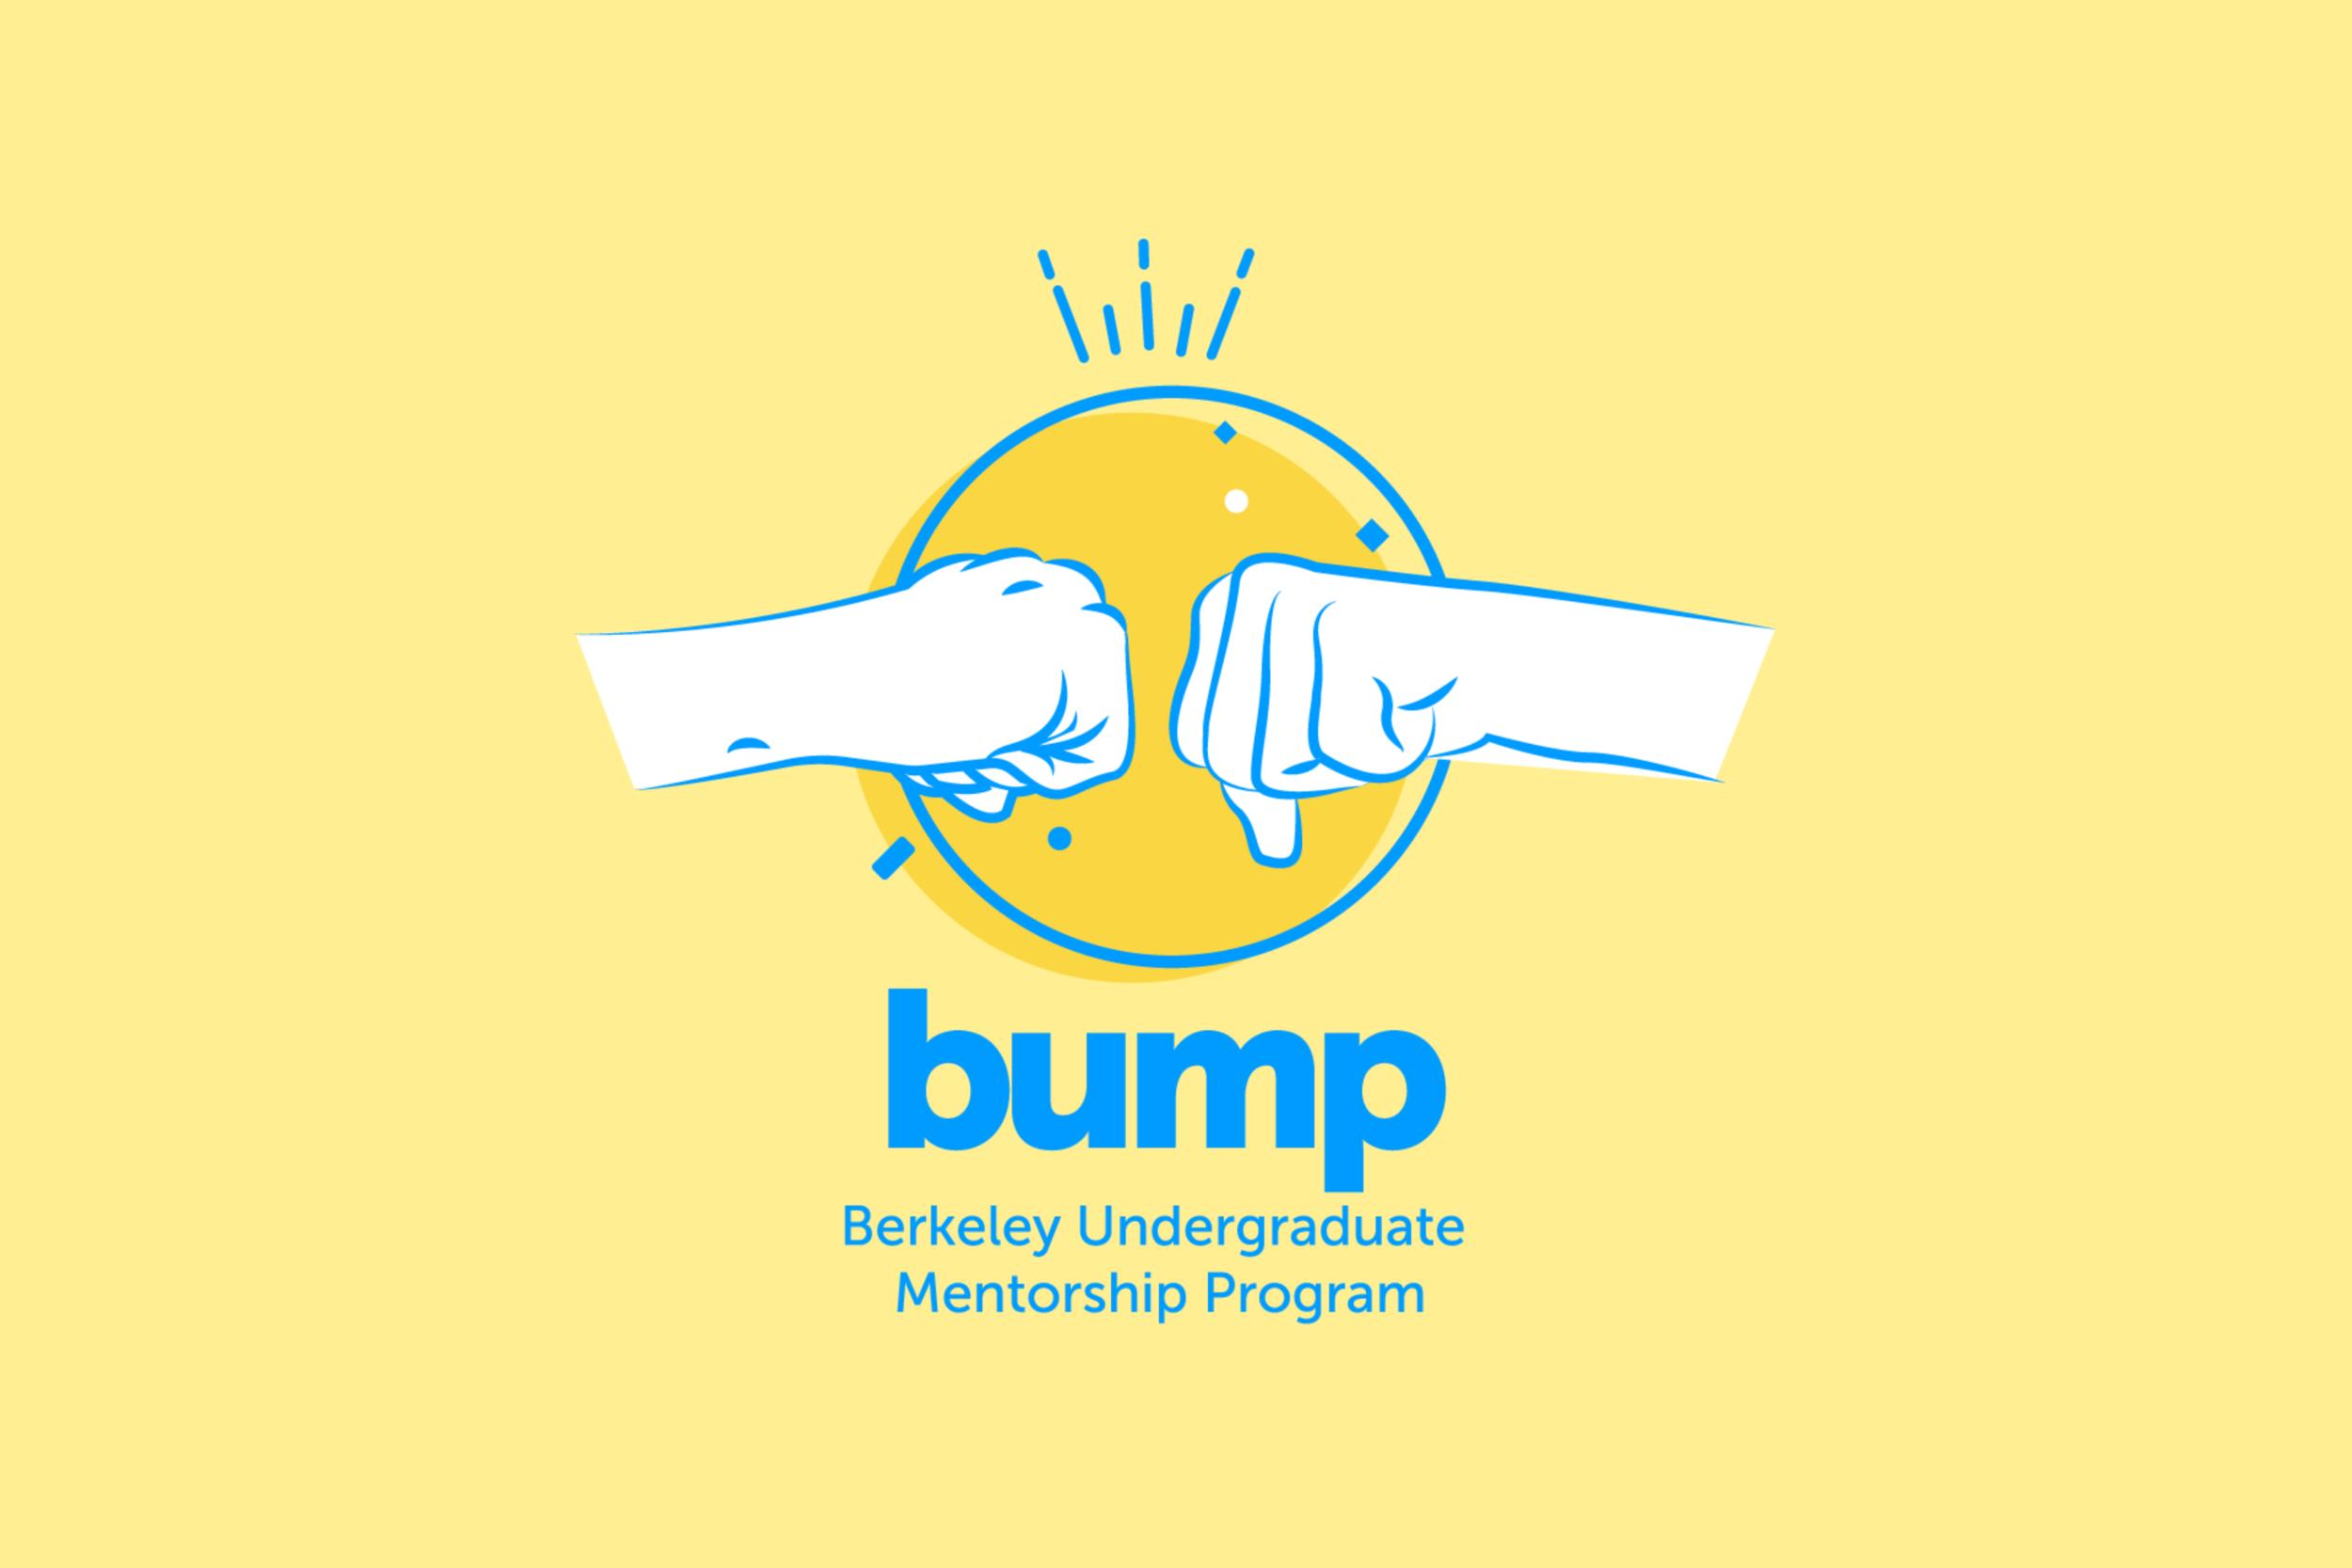 Berkeley Undergraduate Mentorship Program BUMP Klesis Berkeley